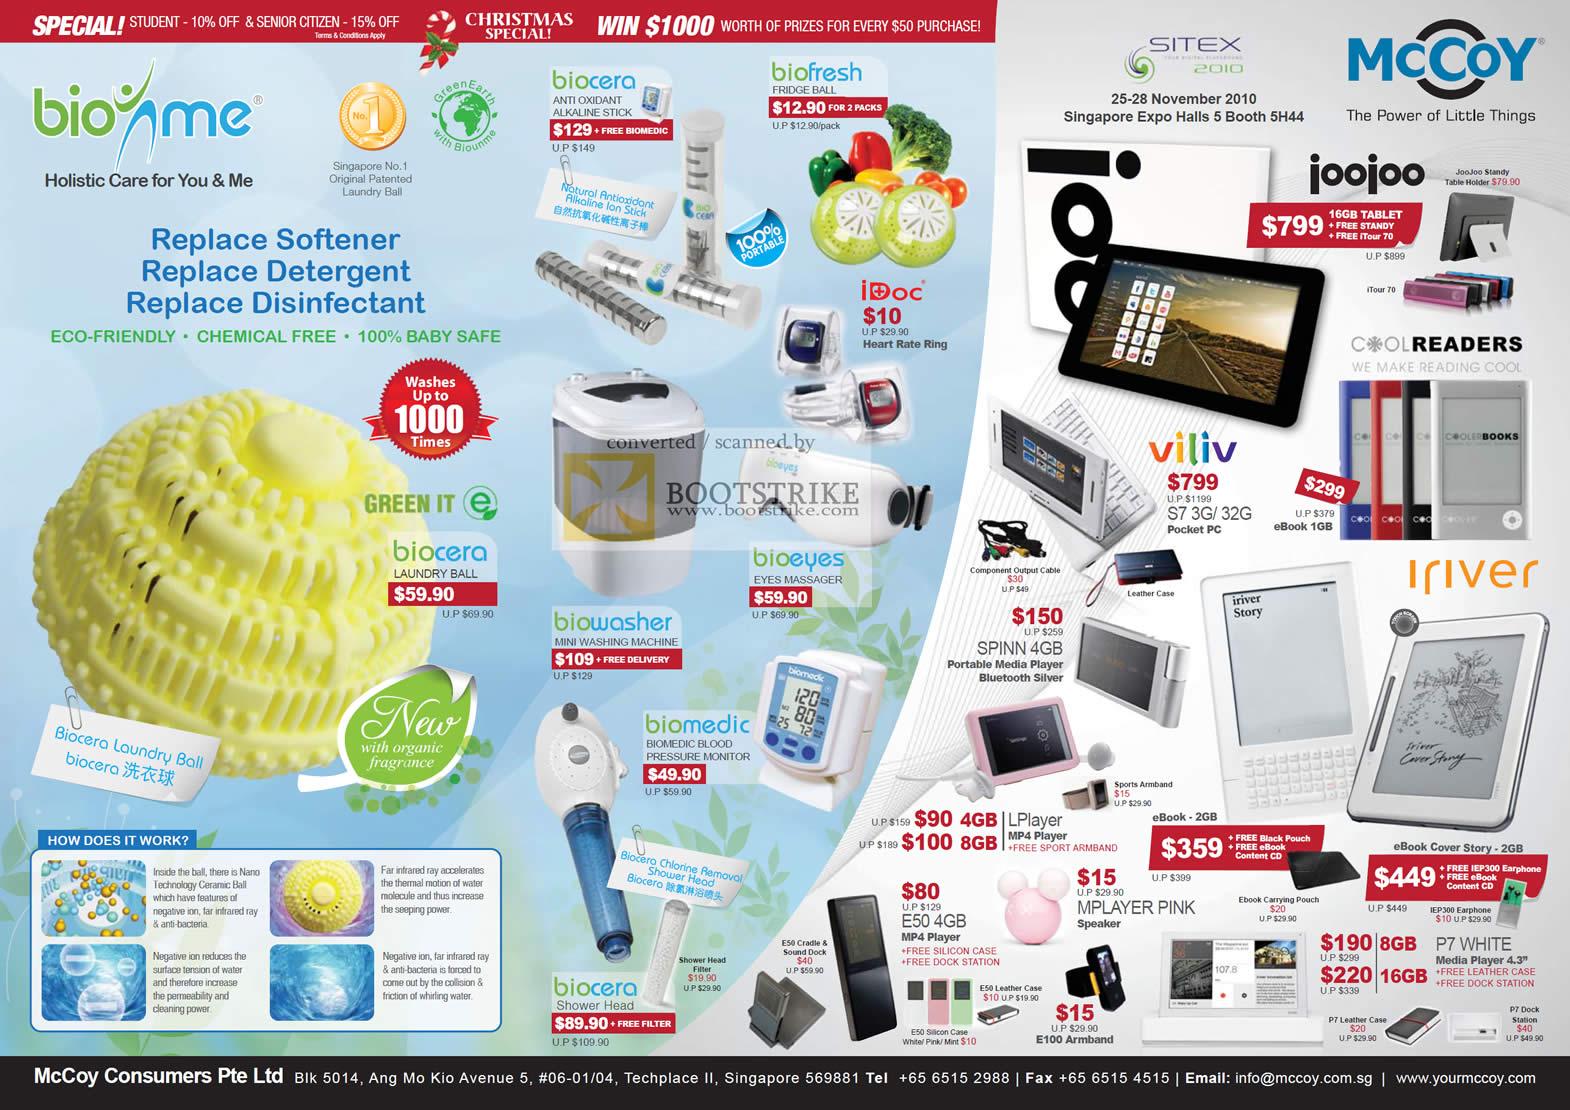 Sitex 2010 price list image brochure of Mccoy Biounme Biocera Biofresh Biowasher Biomedic Joojoo Coolreaders Viliv Iriver Mplayer Spinn